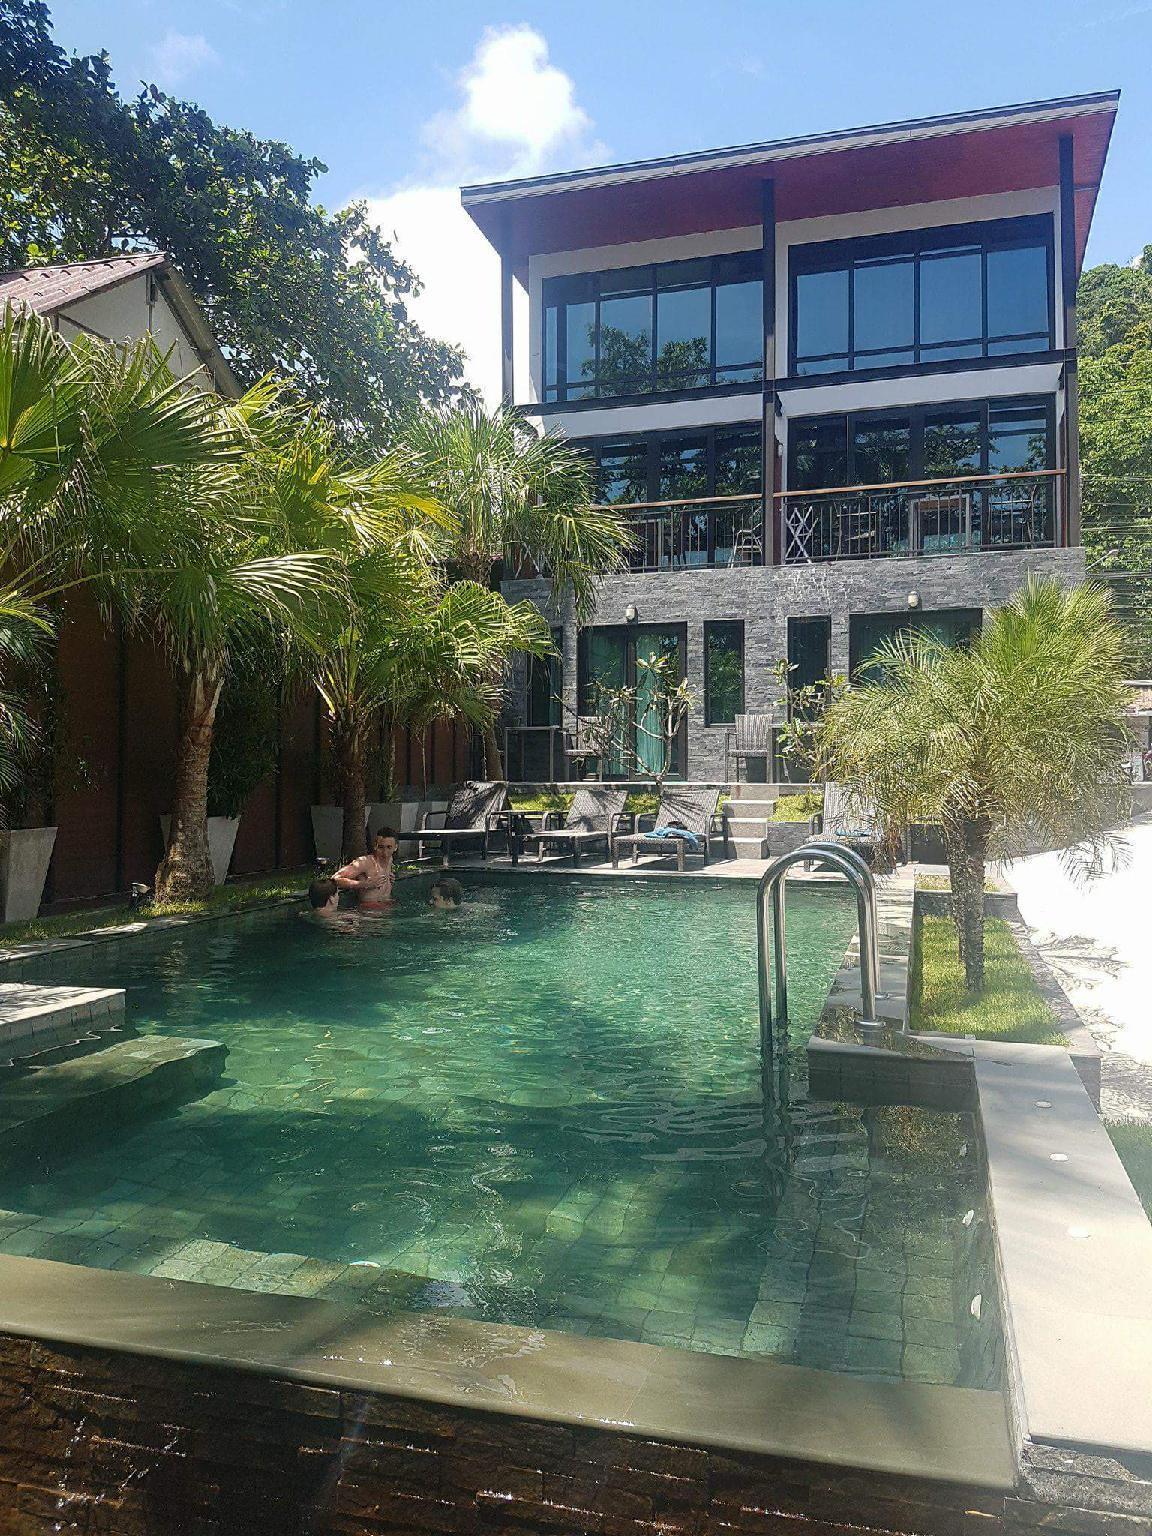 15 Palms Beach Resort 15 ปาล์มบีช รีสอร์ต